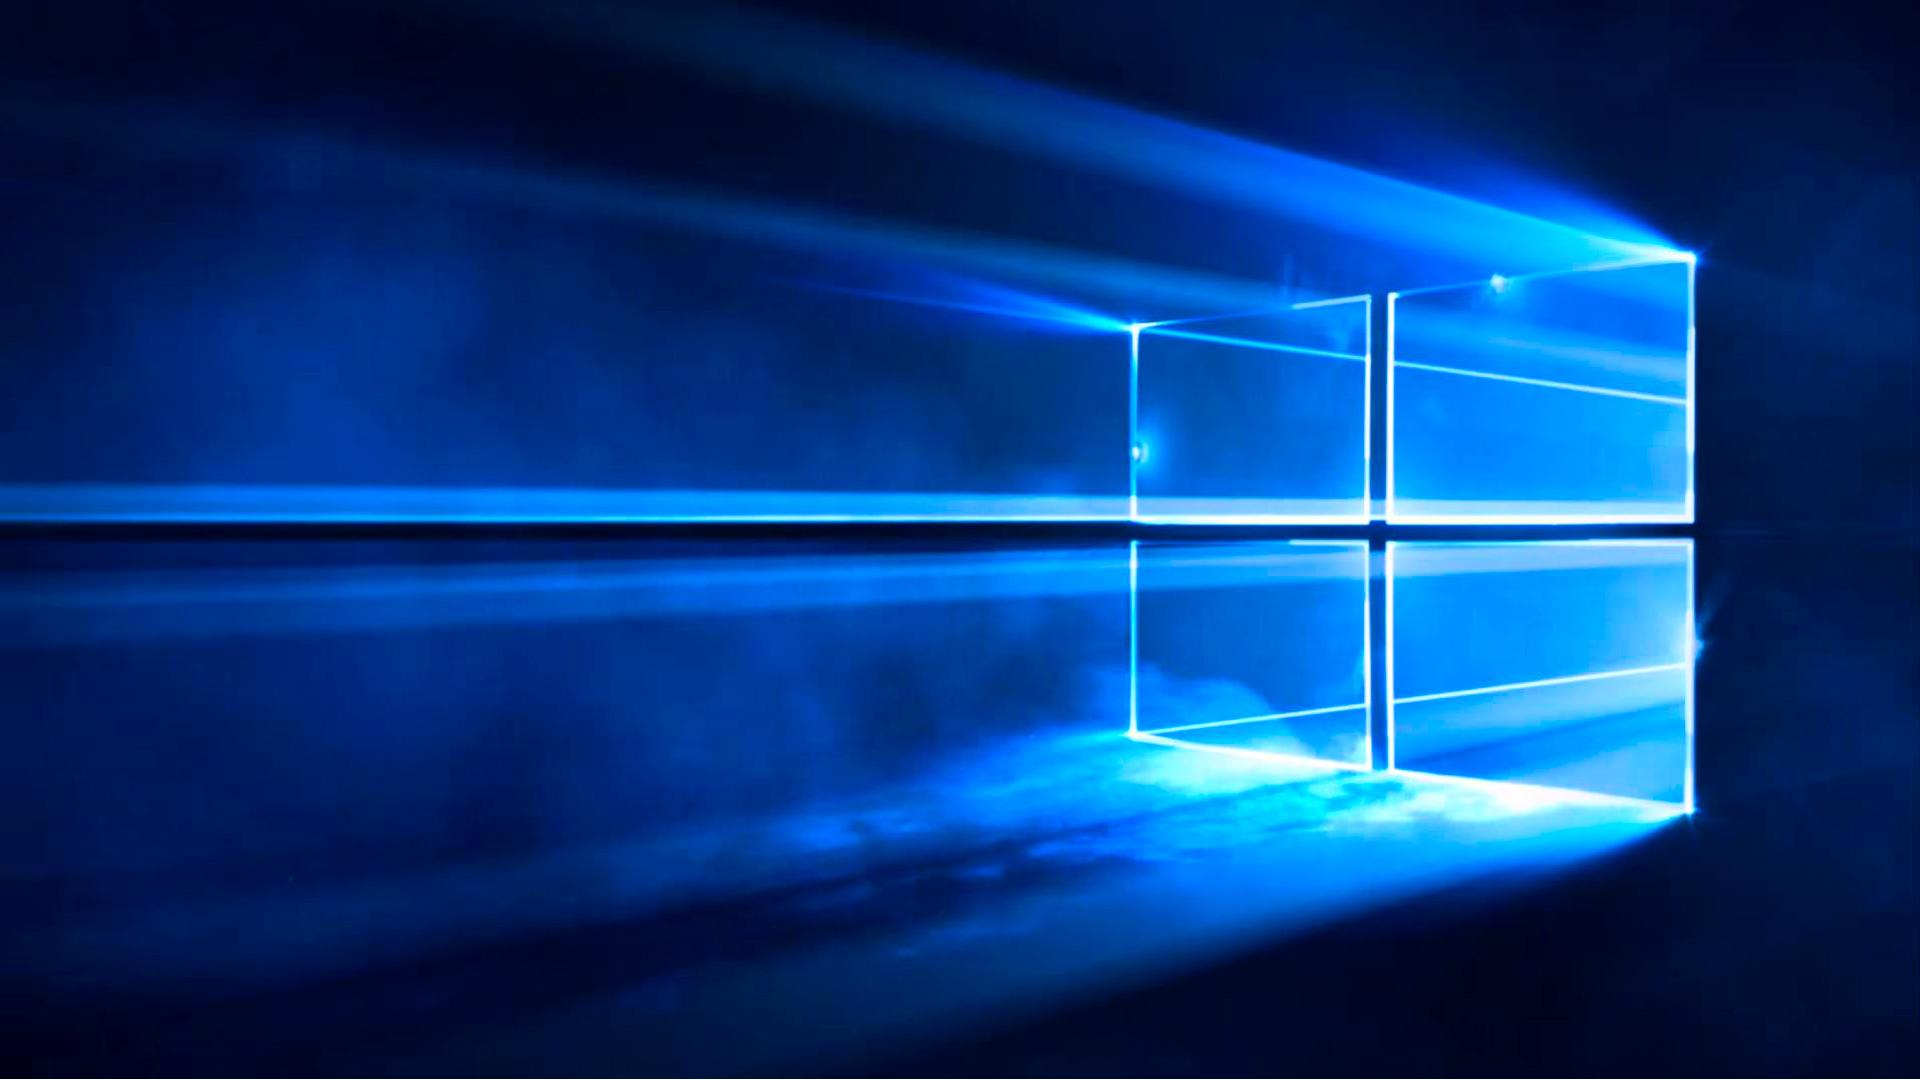 49 Windows 10 Hero Wallpaper 1080 On Wallpapersafari